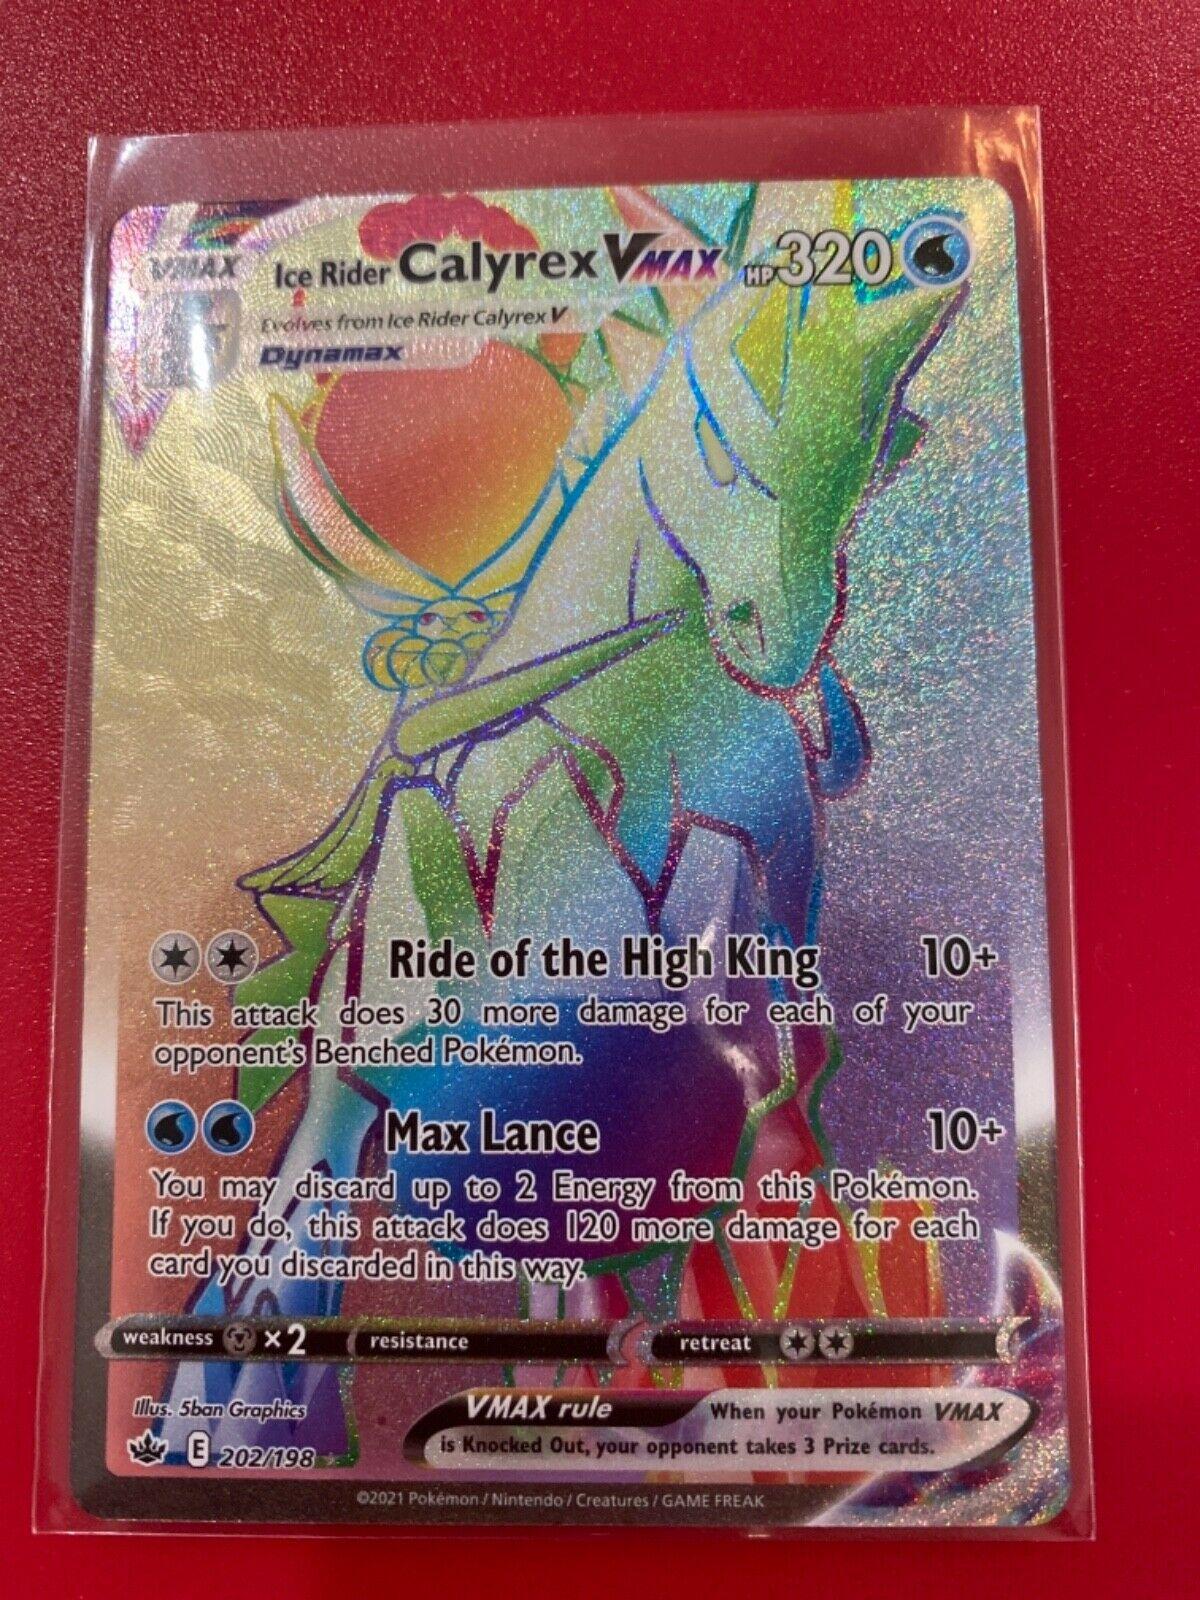 Extra Mint Ice Rider Calyrex Vmax Rainbow Rare- 202/198 - Chilling Reign Pokémon